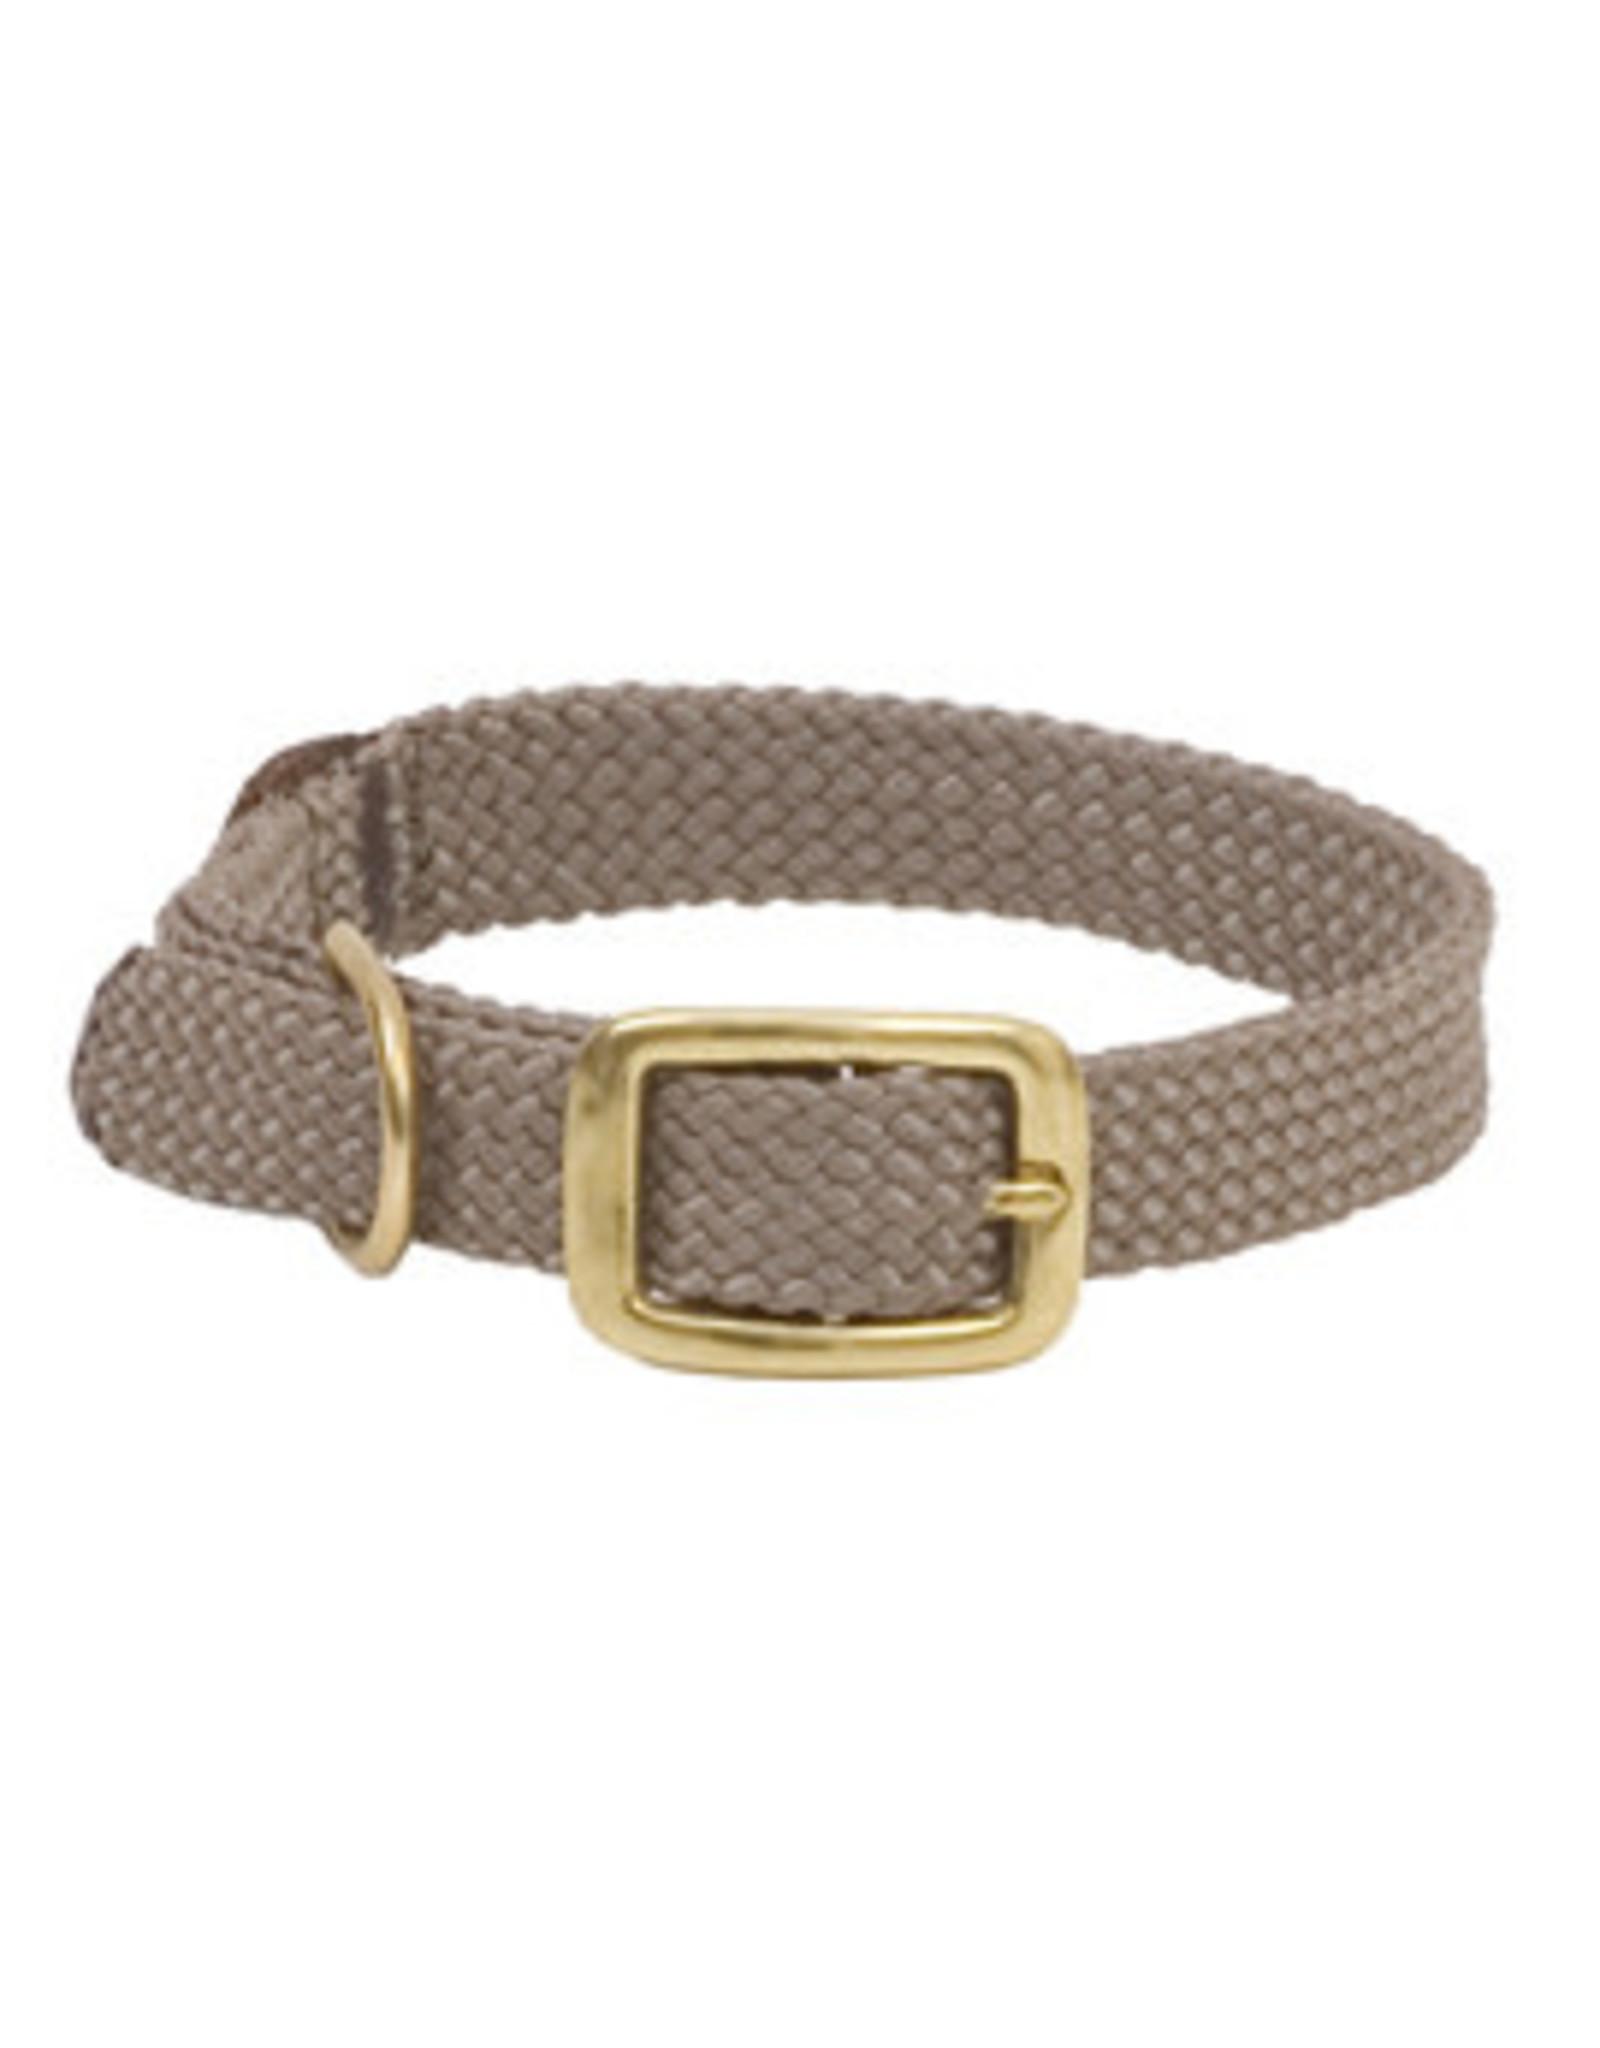 "Mendota Mendota Double-Braid Jr. Collar TAN 9/16"" x14"""